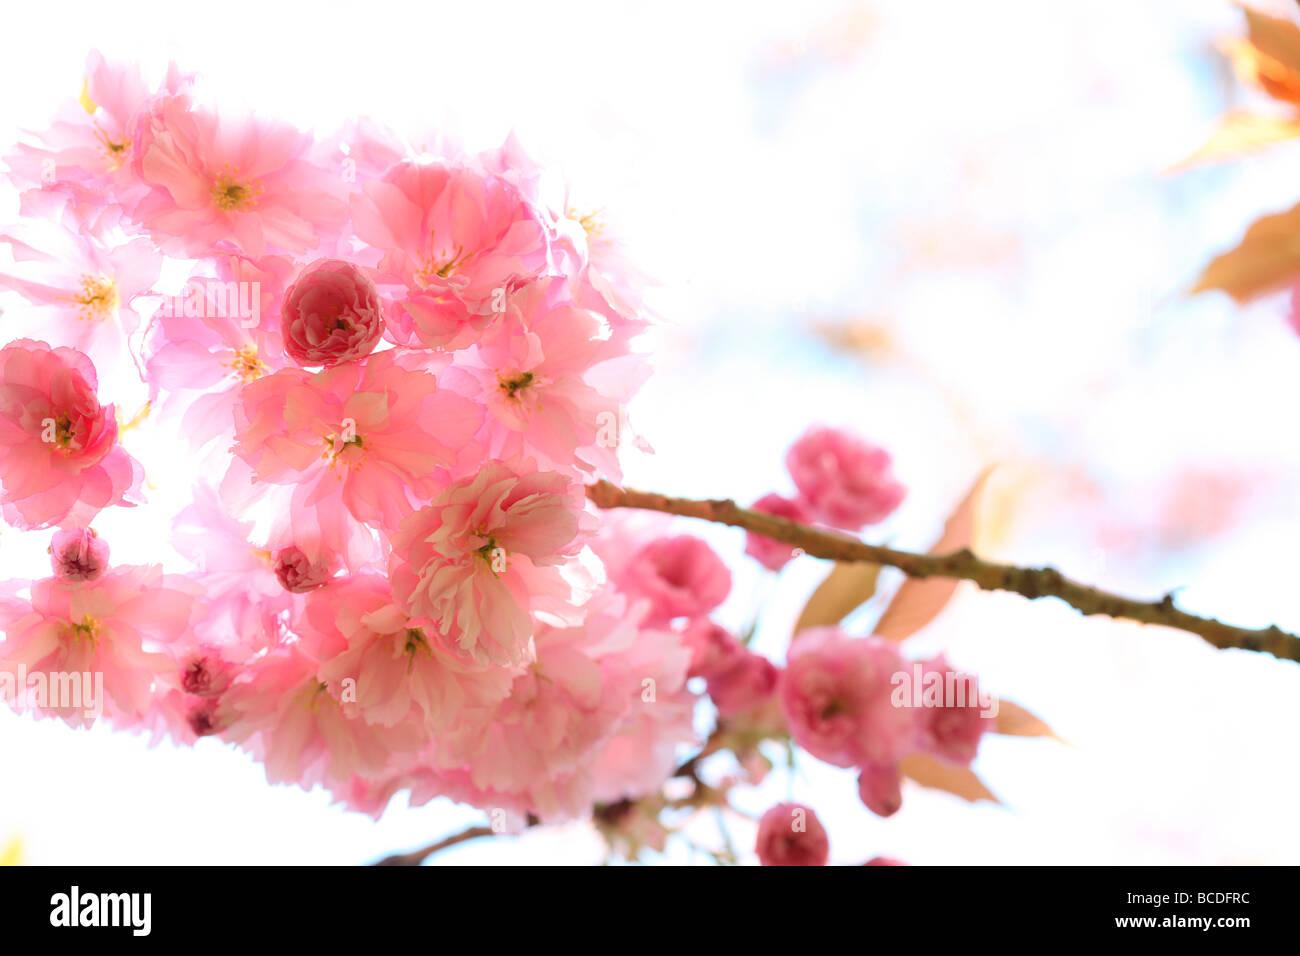 a taste of spring prunus cherry blossom fine art photography Jane Ann Butler Photography JABP455 - Stock Image